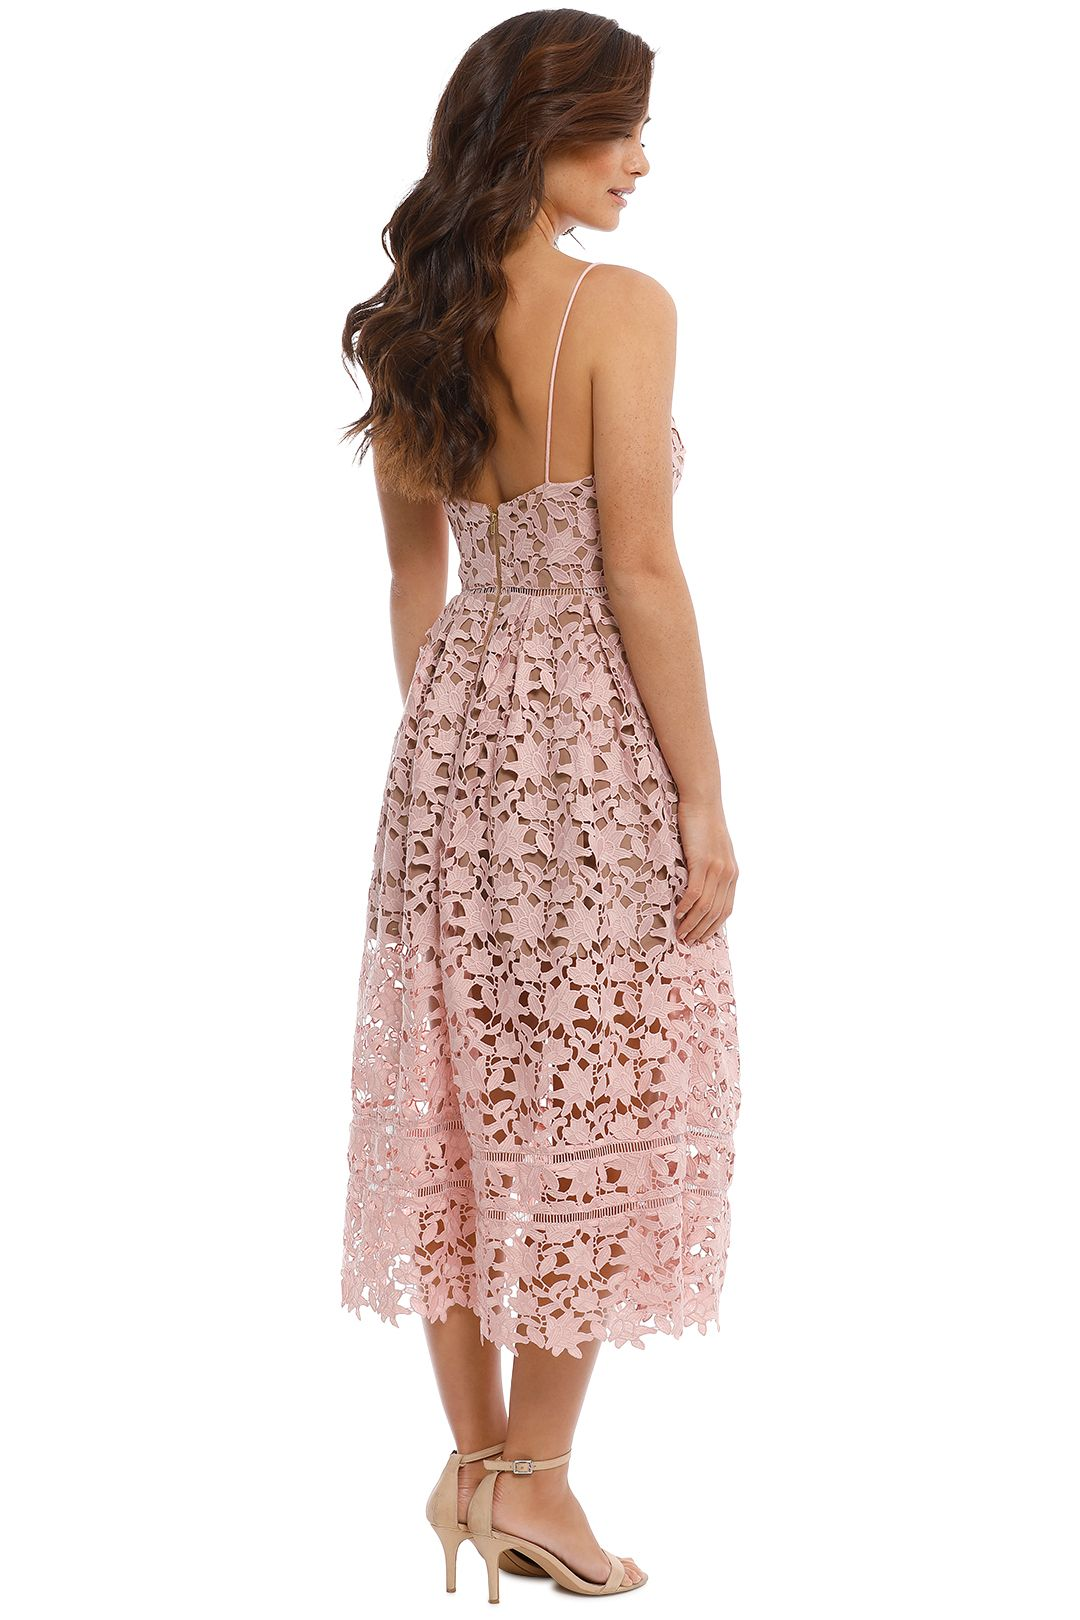 Self Portrait - Azaelea Lace Midi Dress - Pale Pink - Back